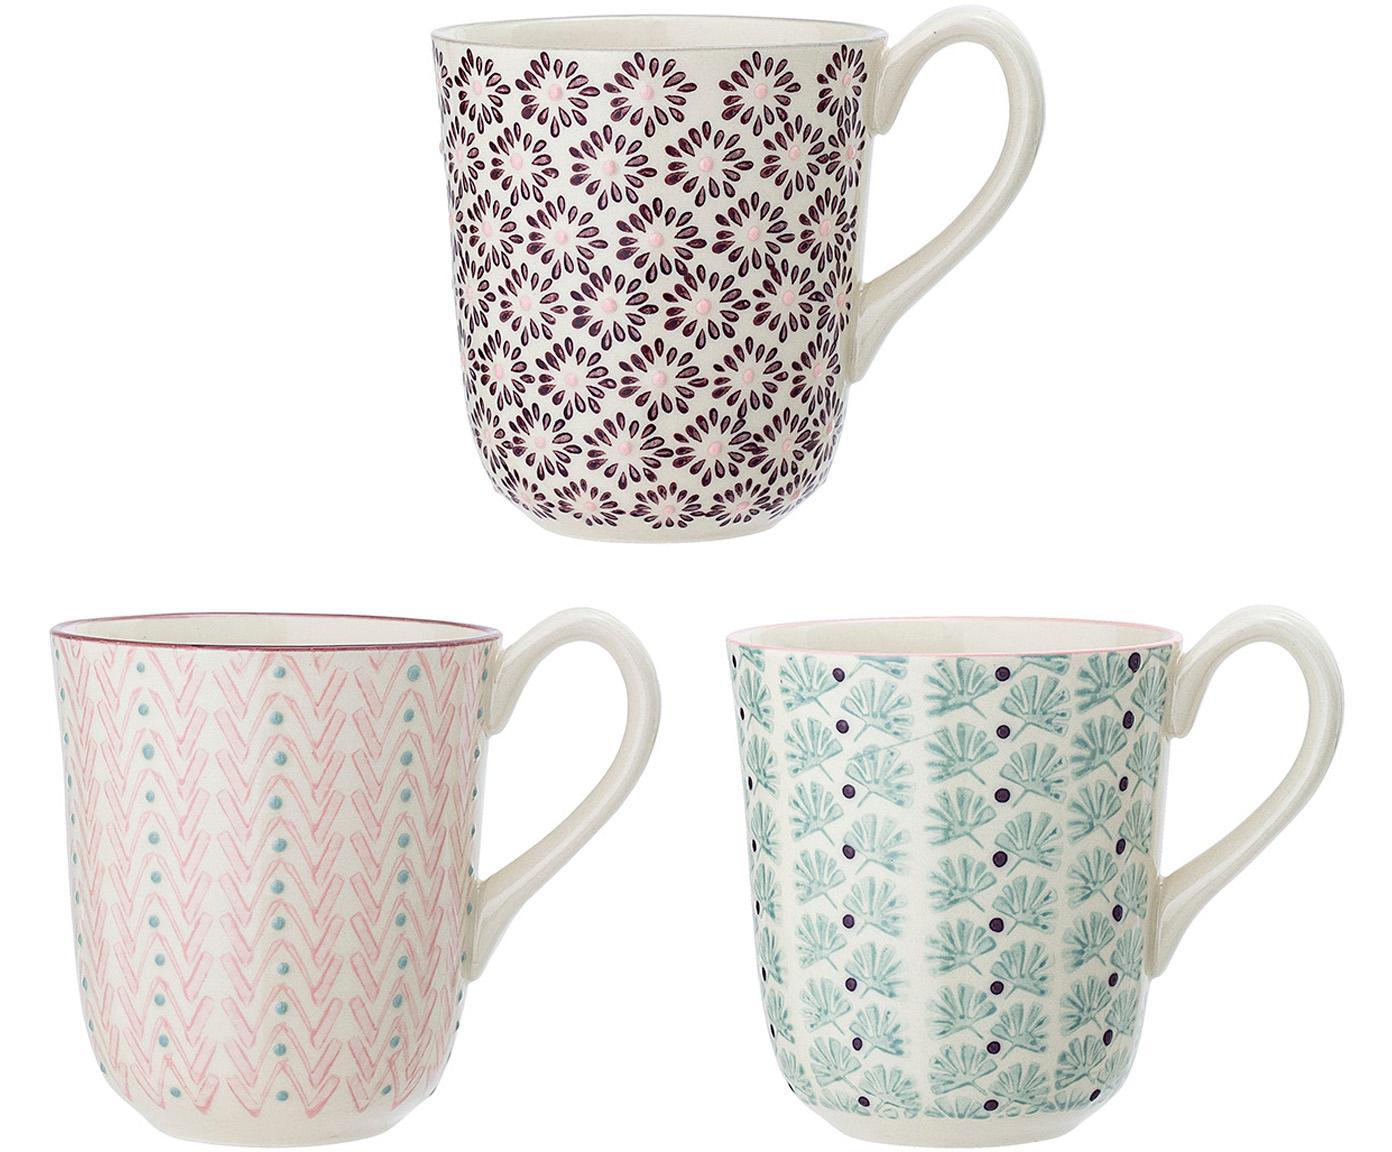 Tassen-Set Maya, 3-tlg., Steingut, Weiß, Grün, Rosa, Lila, Ø 9 x H 10 cm